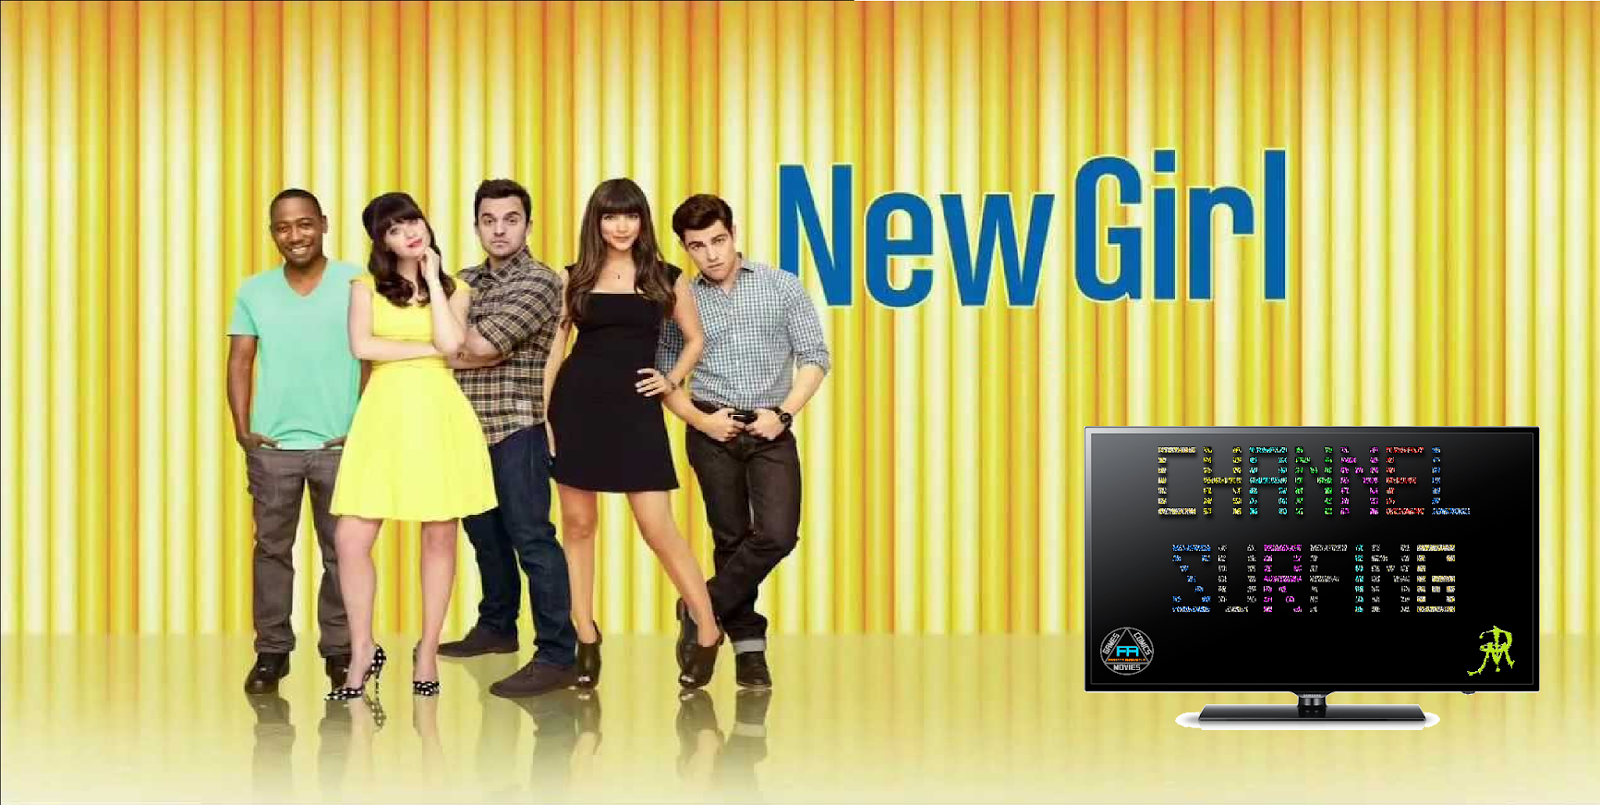 Watch New Girl on Fox Season 4 episode 3